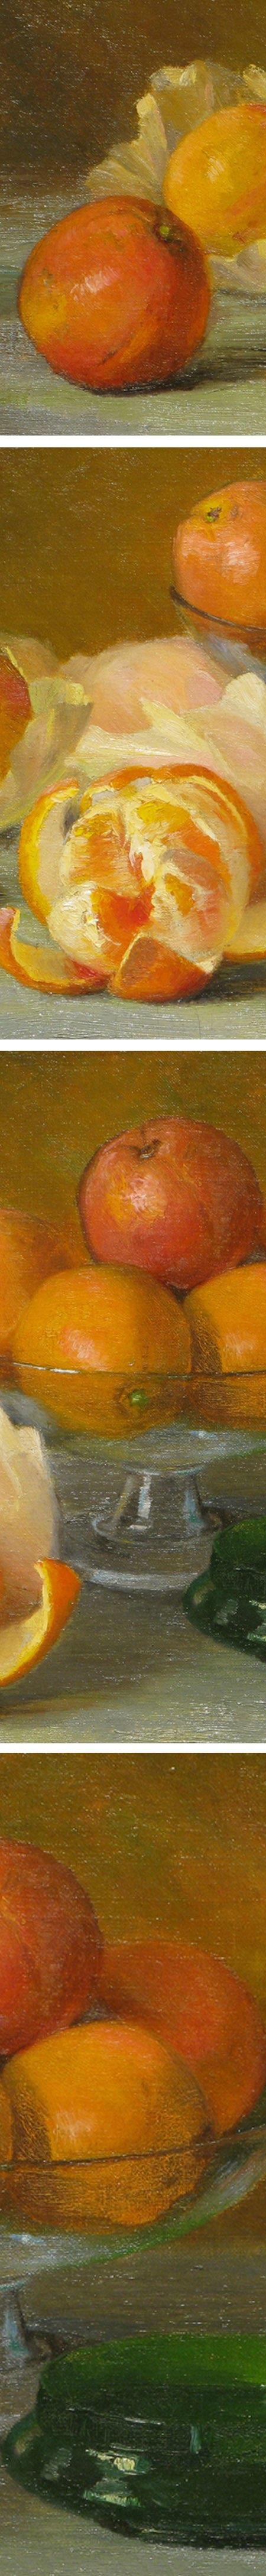 Still Life with Oranges, Adelaide Palmer (details)